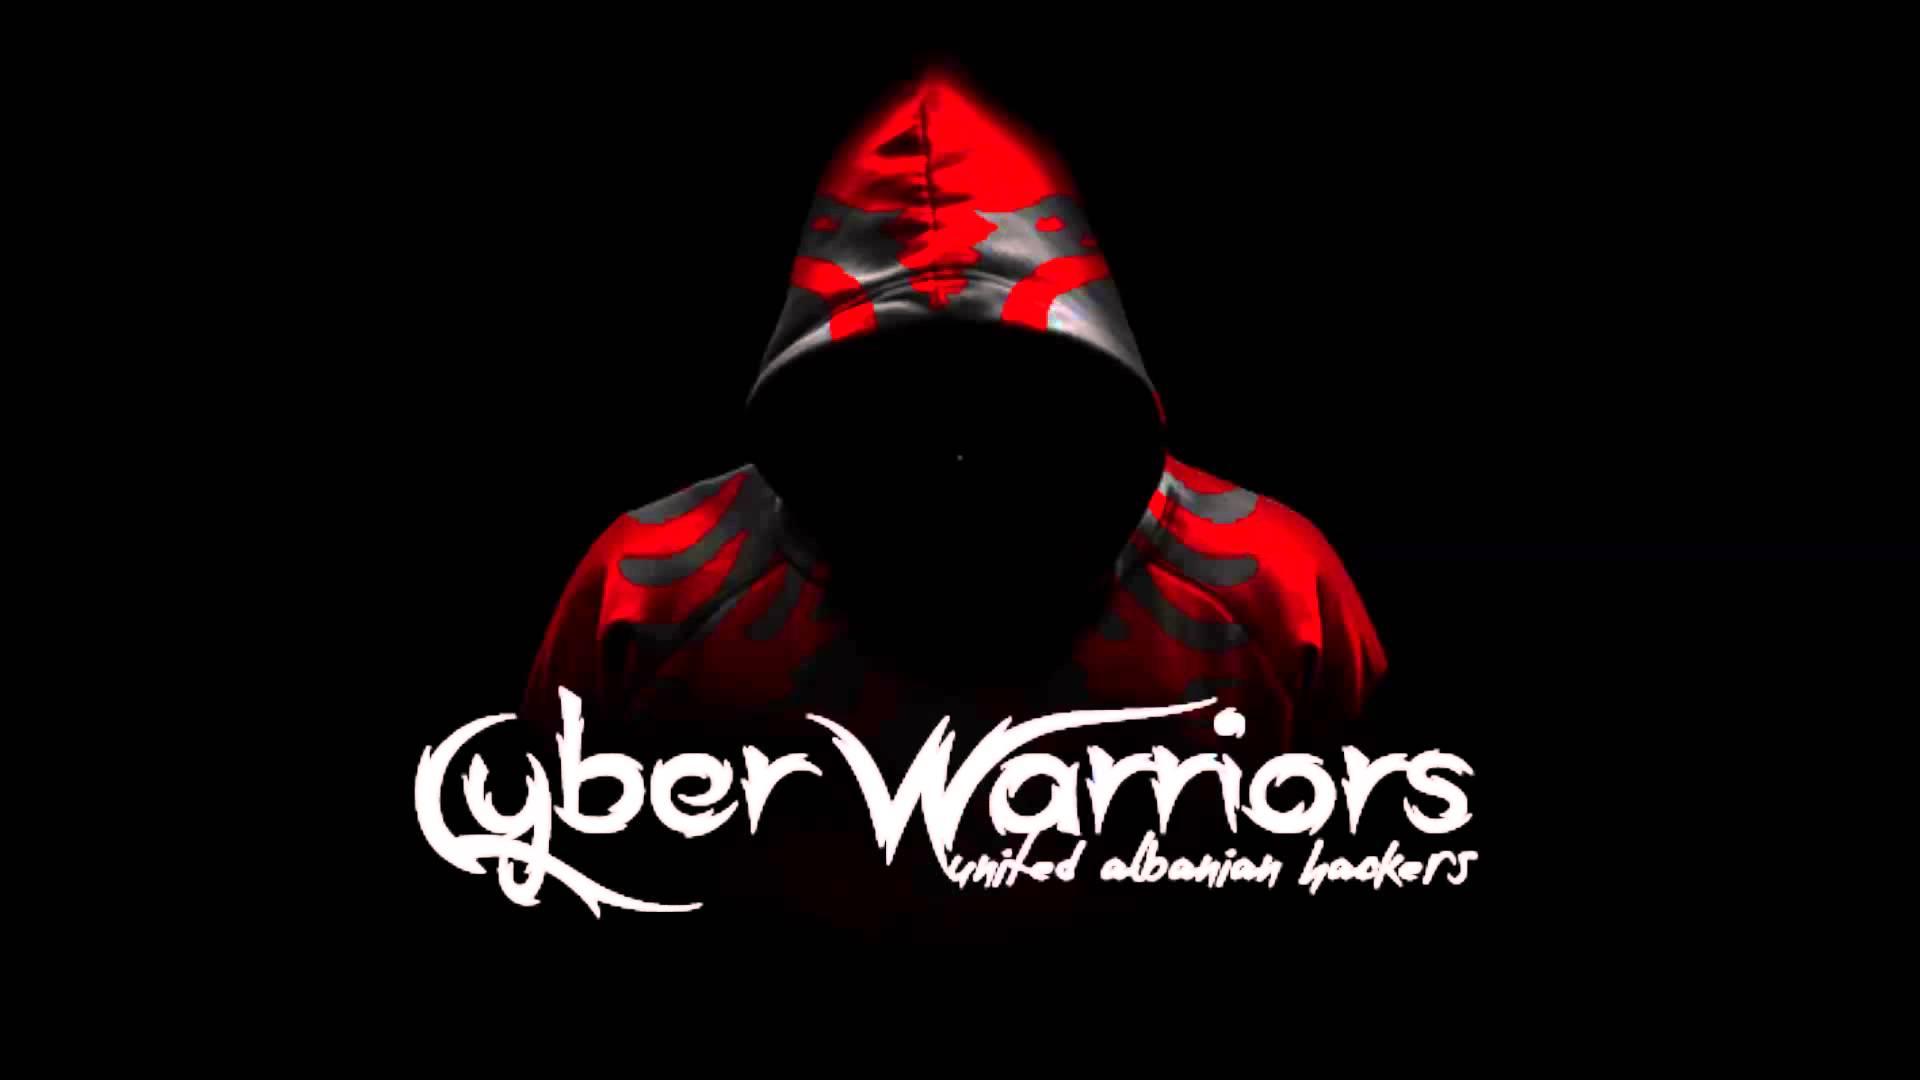 Hacker Logo Wallpapers Top Free Hacker Logo Backgrounds Wallpaperaccess